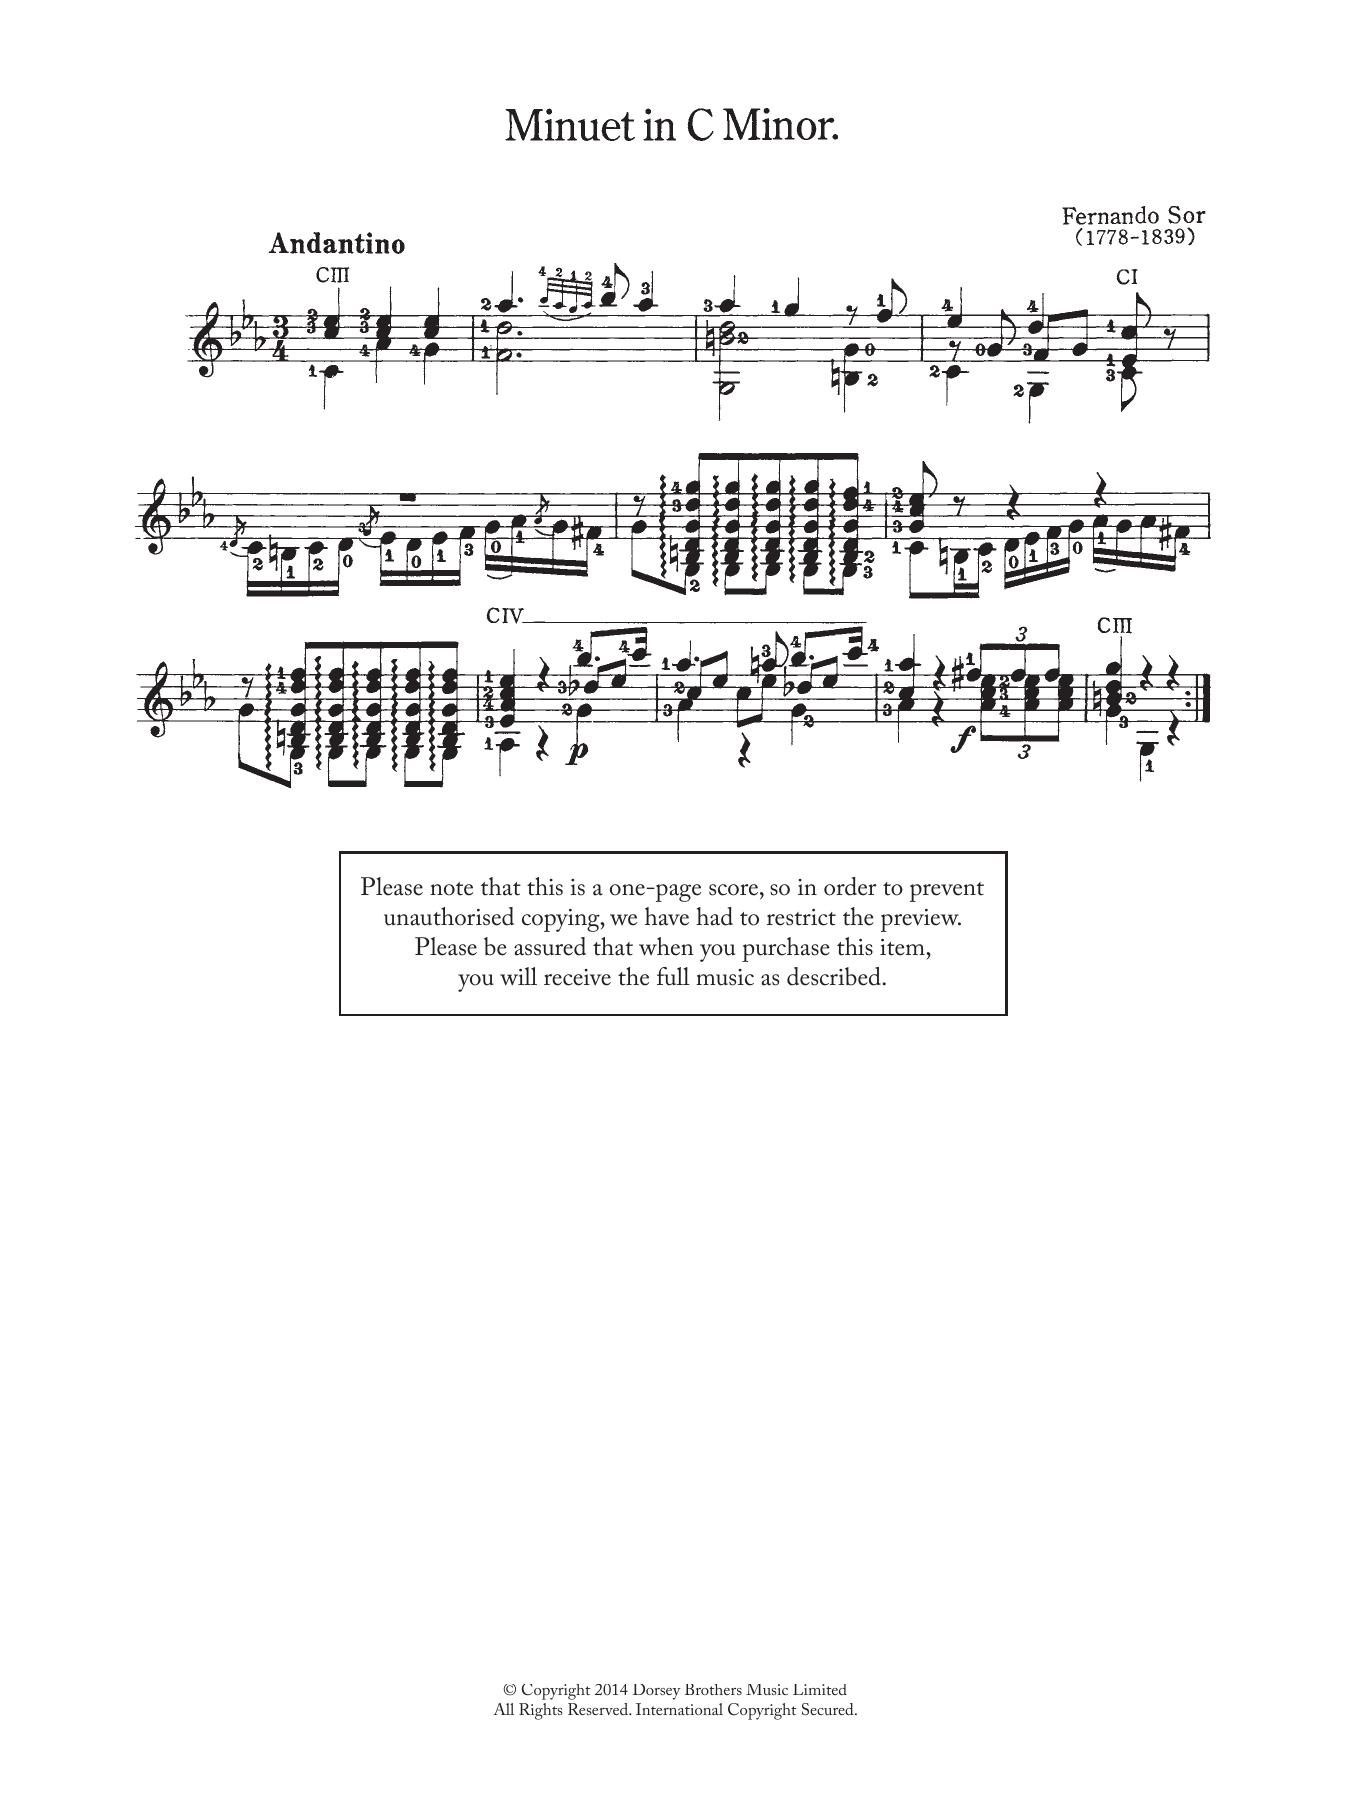 Fernando Sor - Minuet In C Minor